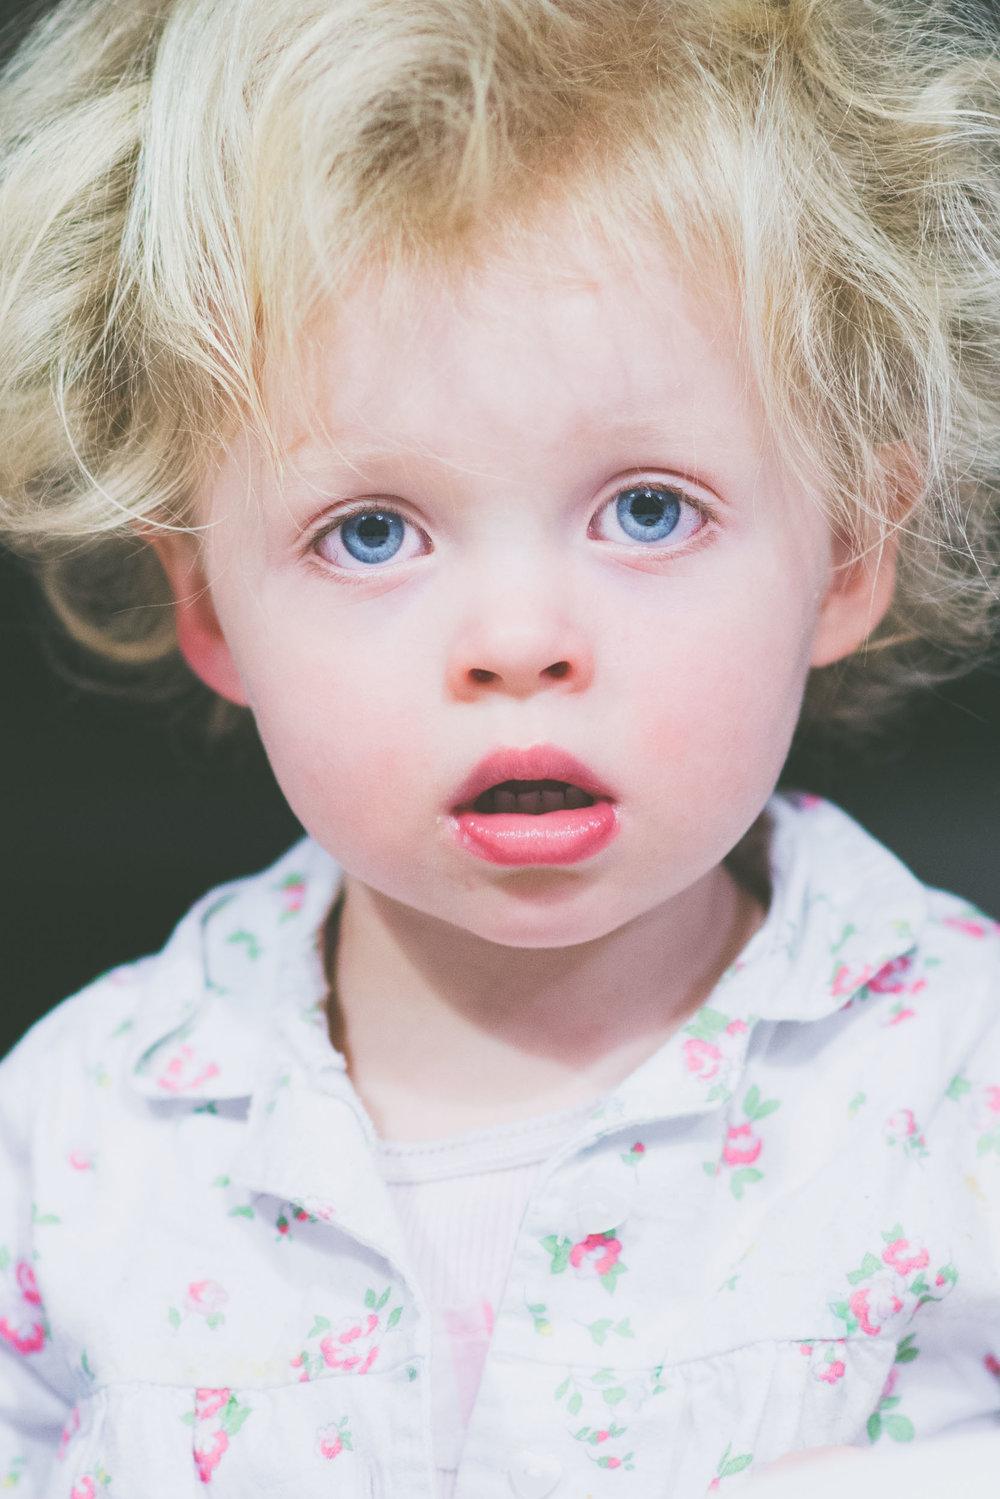 Young blonde girl - Family - Photo credit Nicola Bailey.jpg